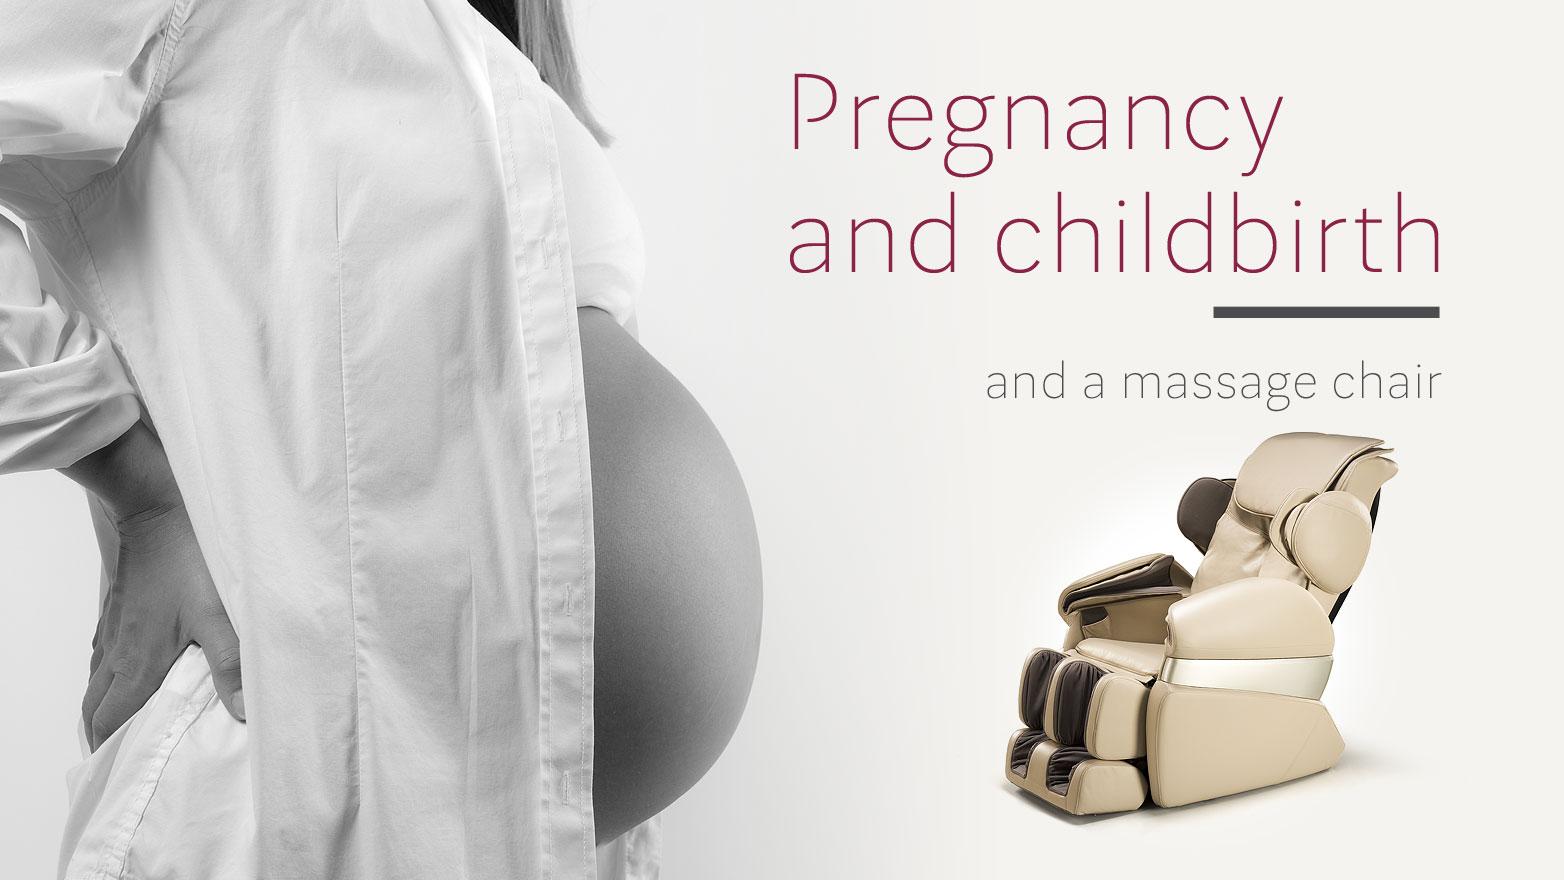 Massage chair during pregnancy